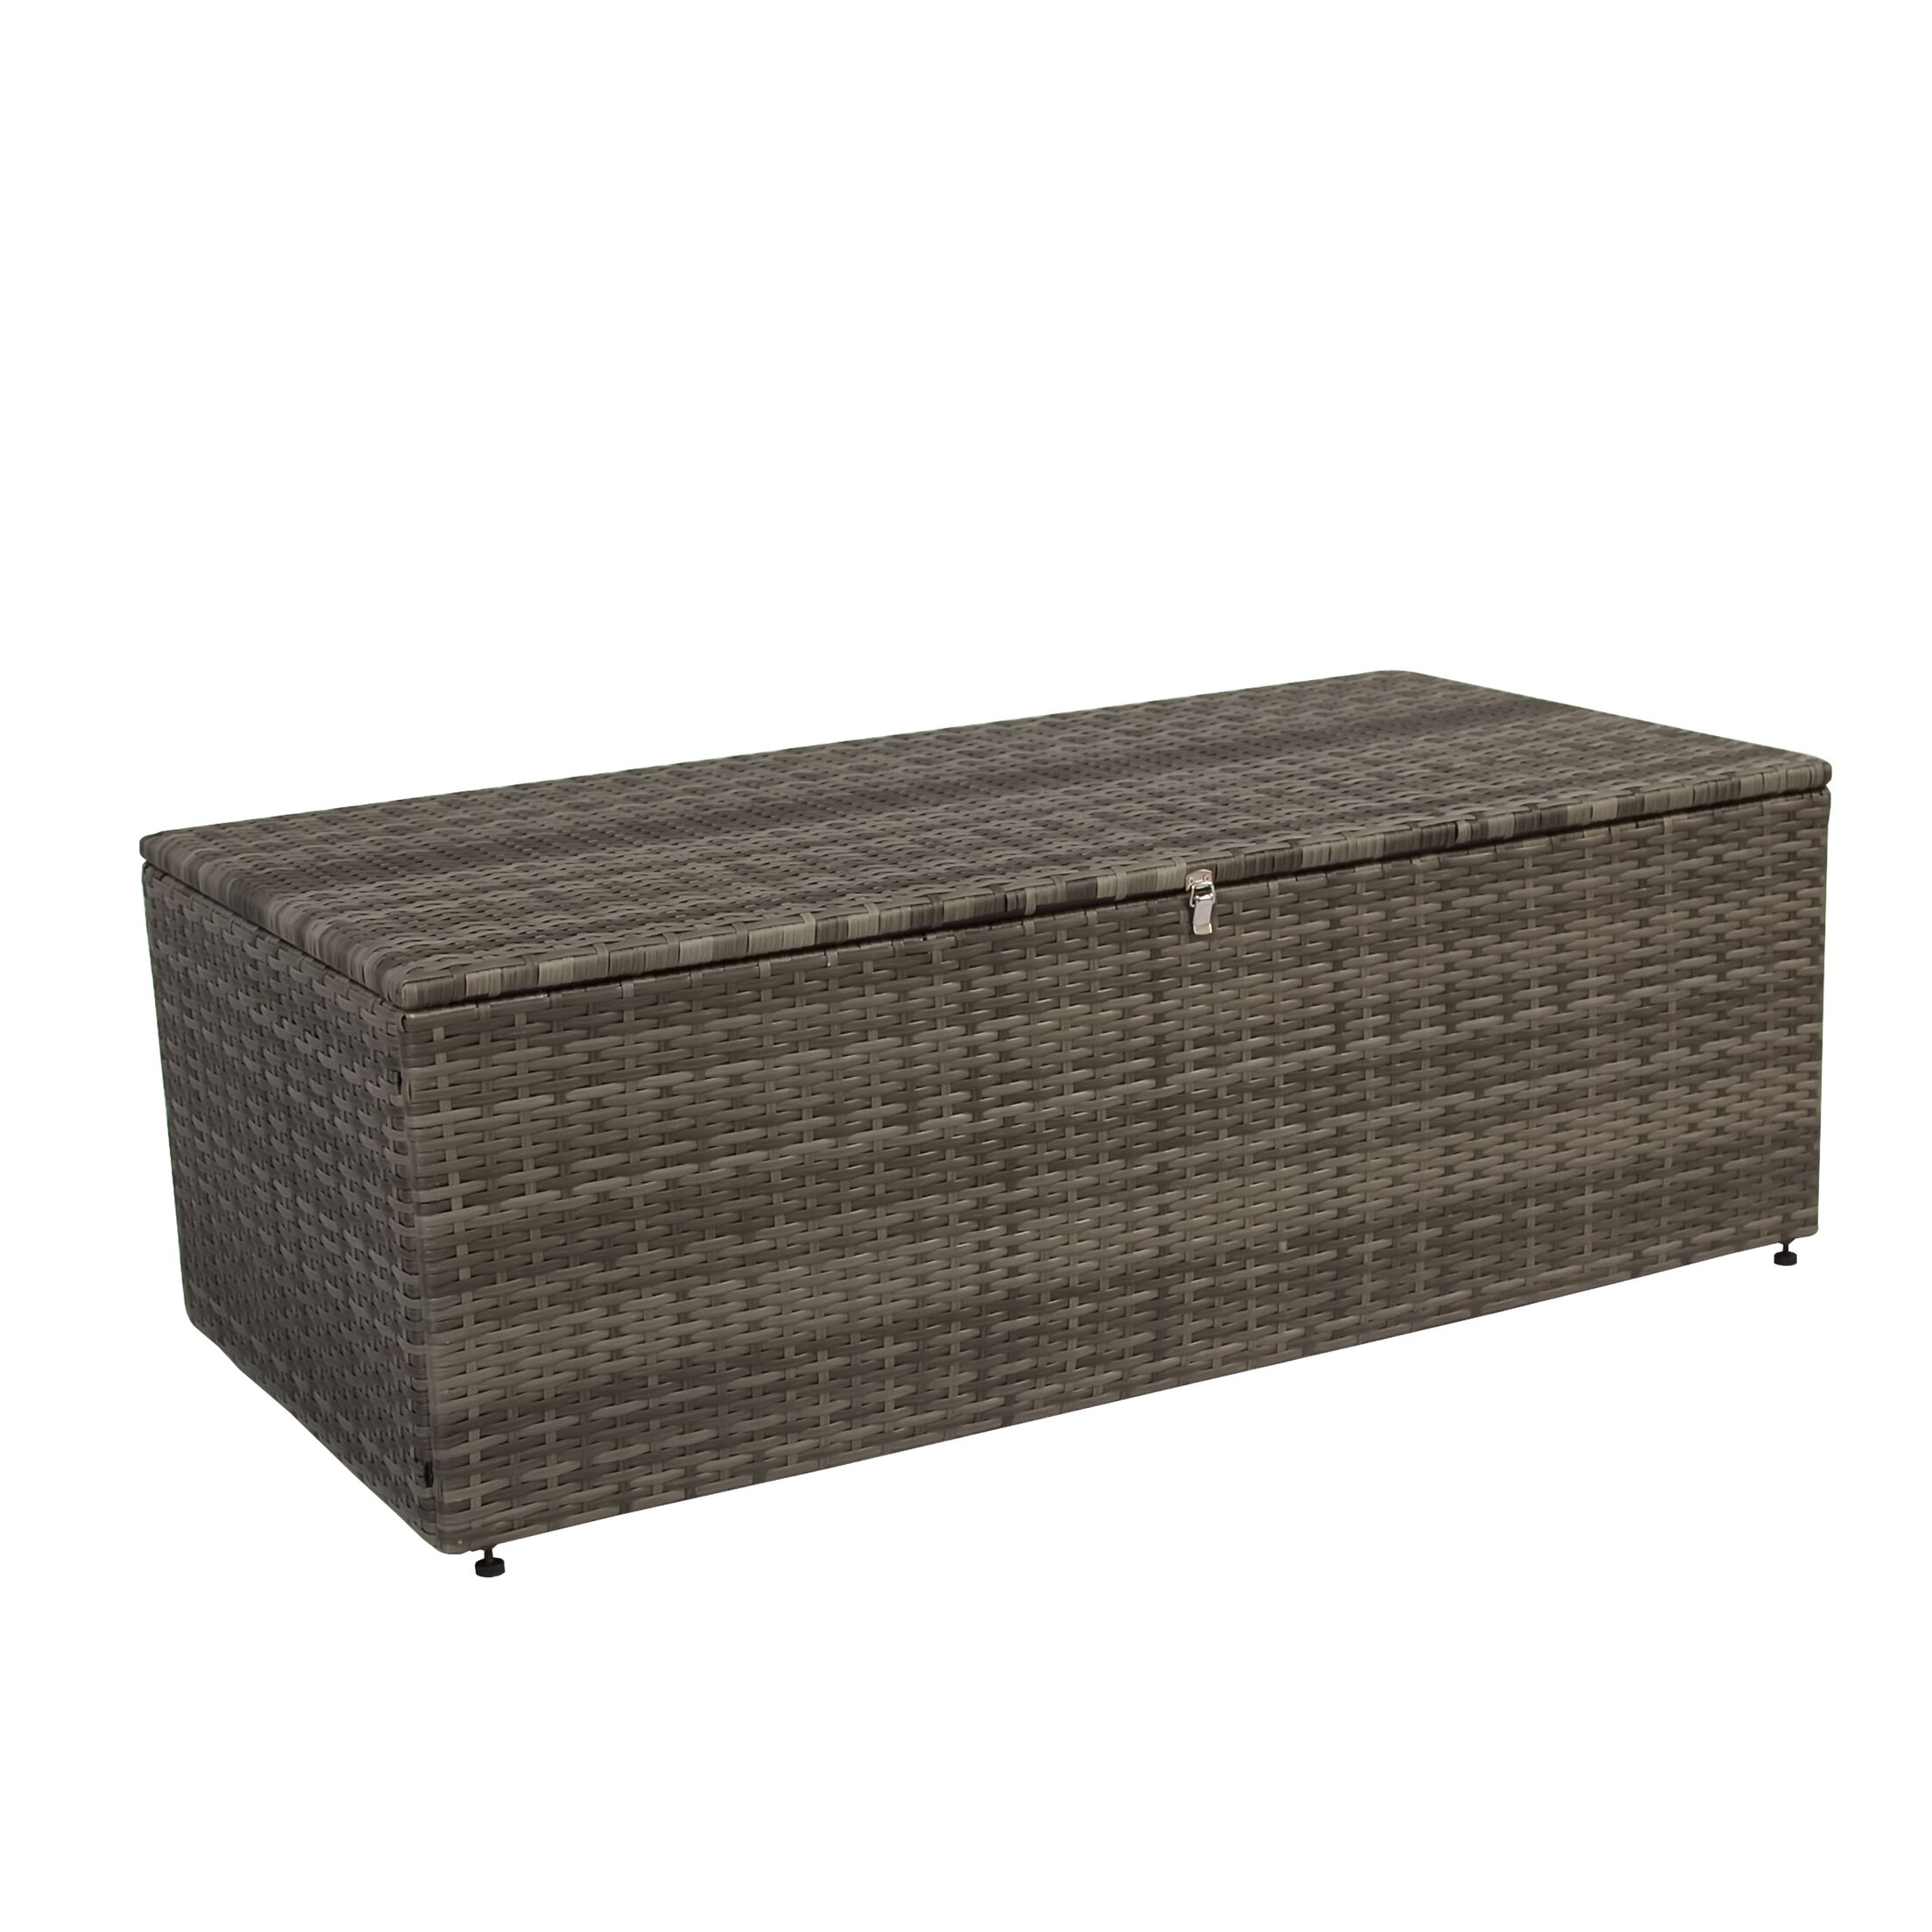 Ridgemoor 5 Piece Sofa Set with Cushions